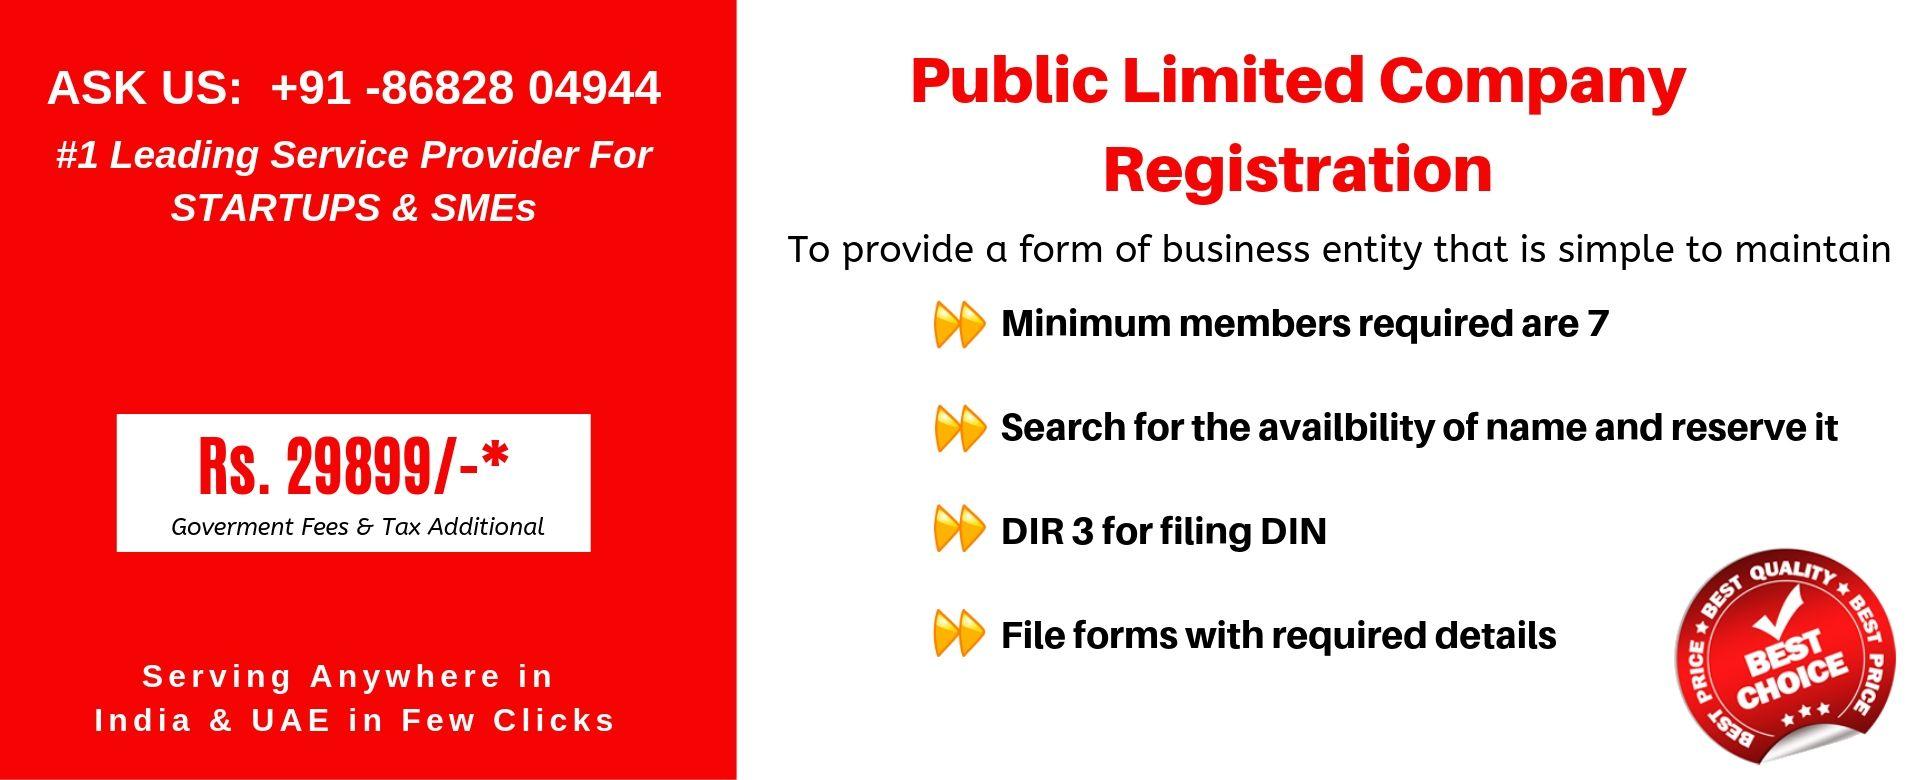 public limited company india